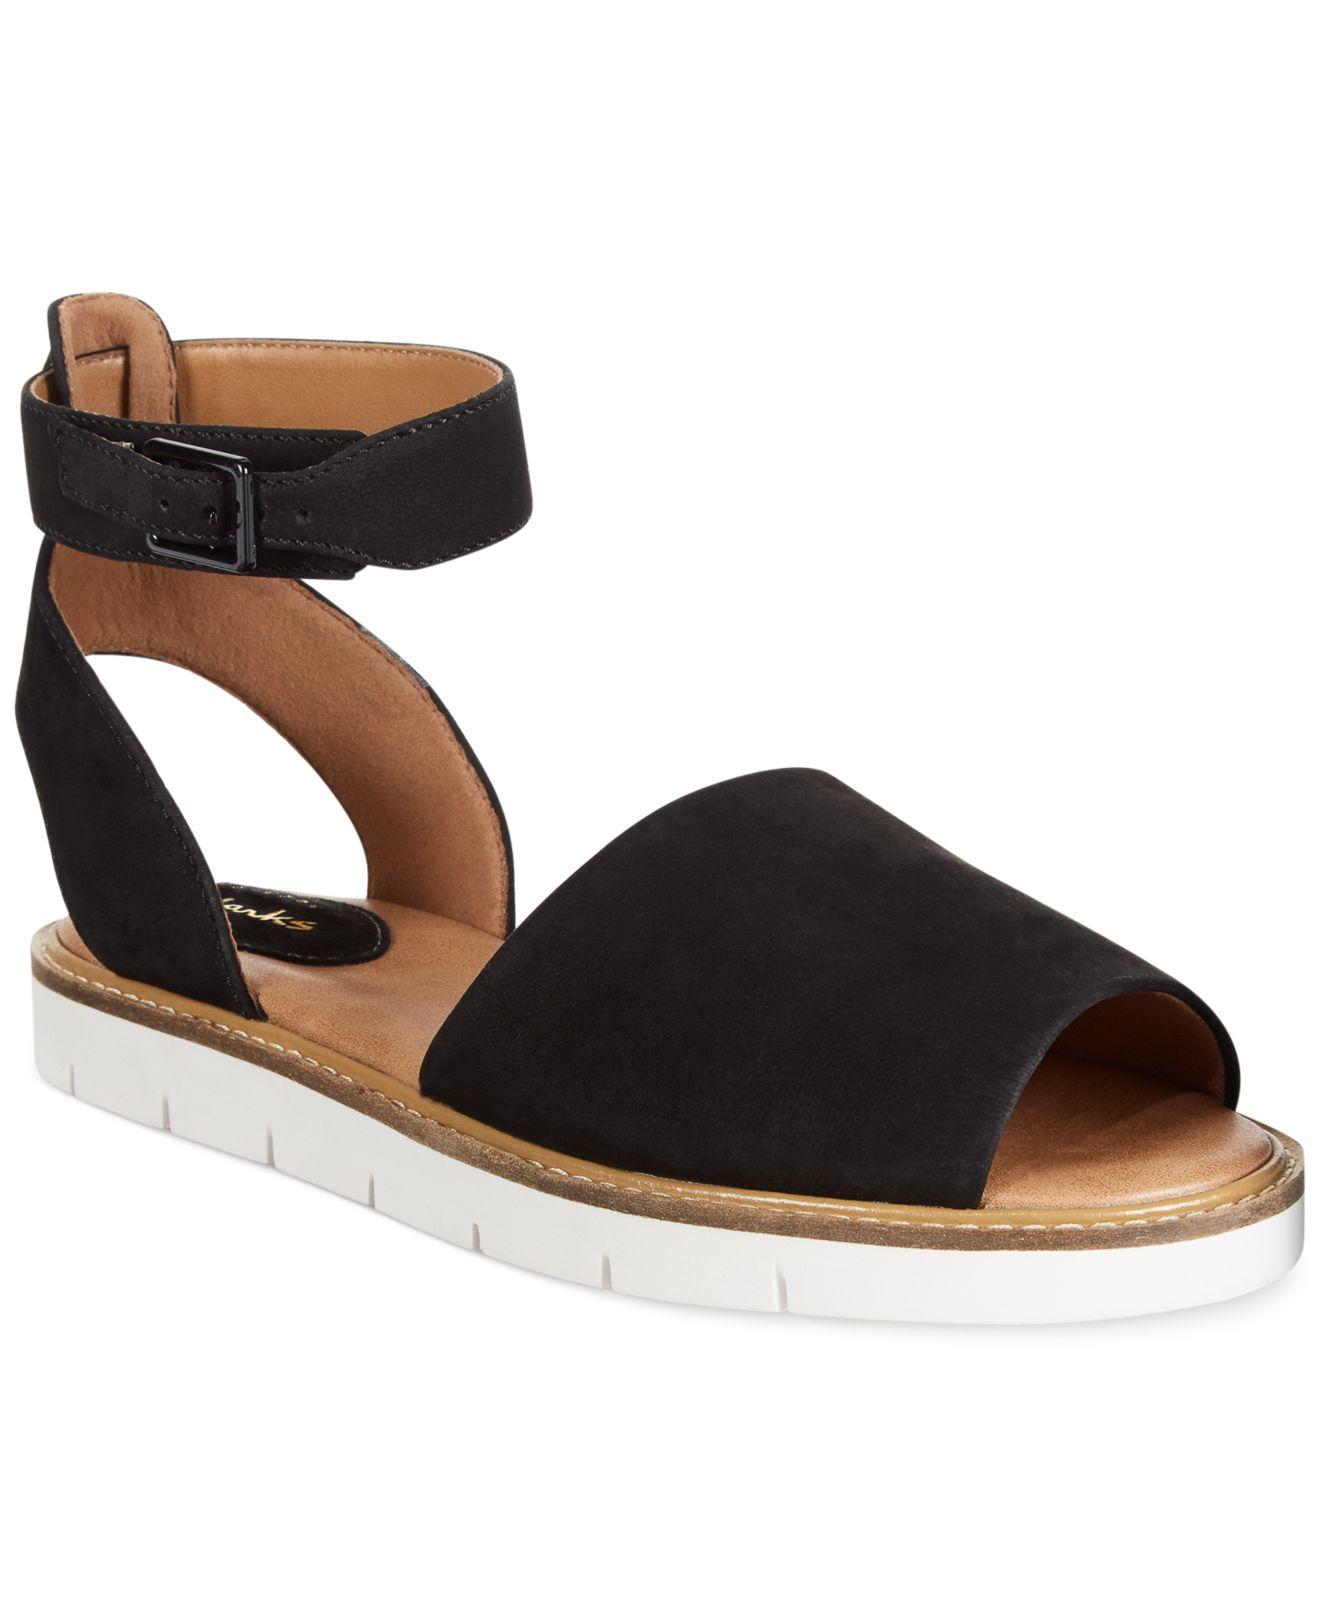 64709f20ae42 Lyst - Clarks Artisan Women s Lydie Hala Flat Sandals in Black